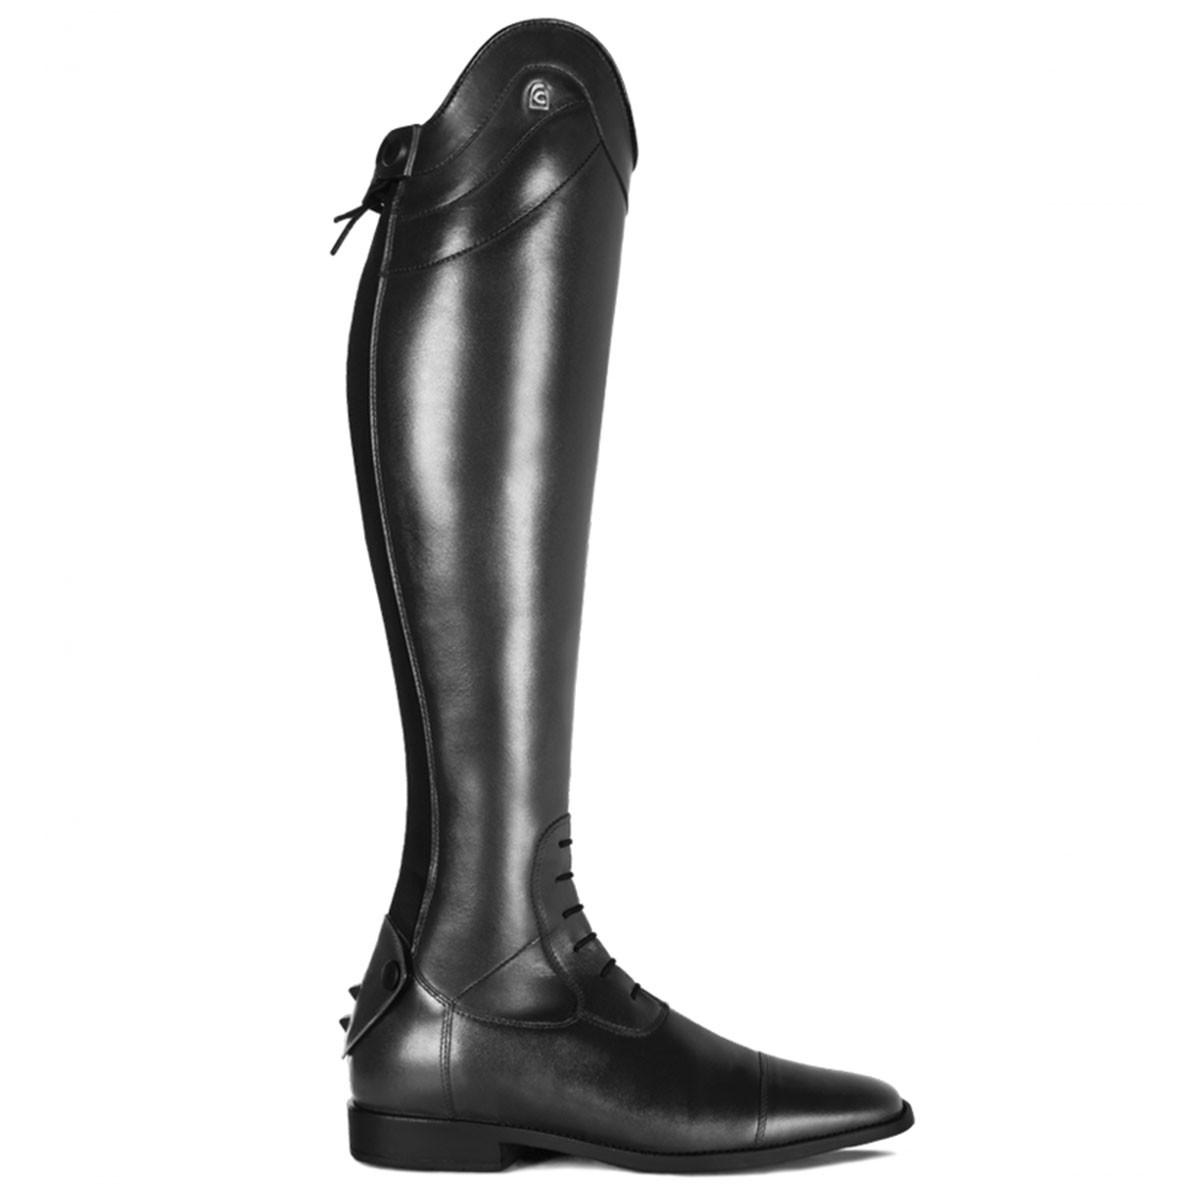 Cavallo Linus Slim rijlaars zwart maat:4-4.5 / h46-w31